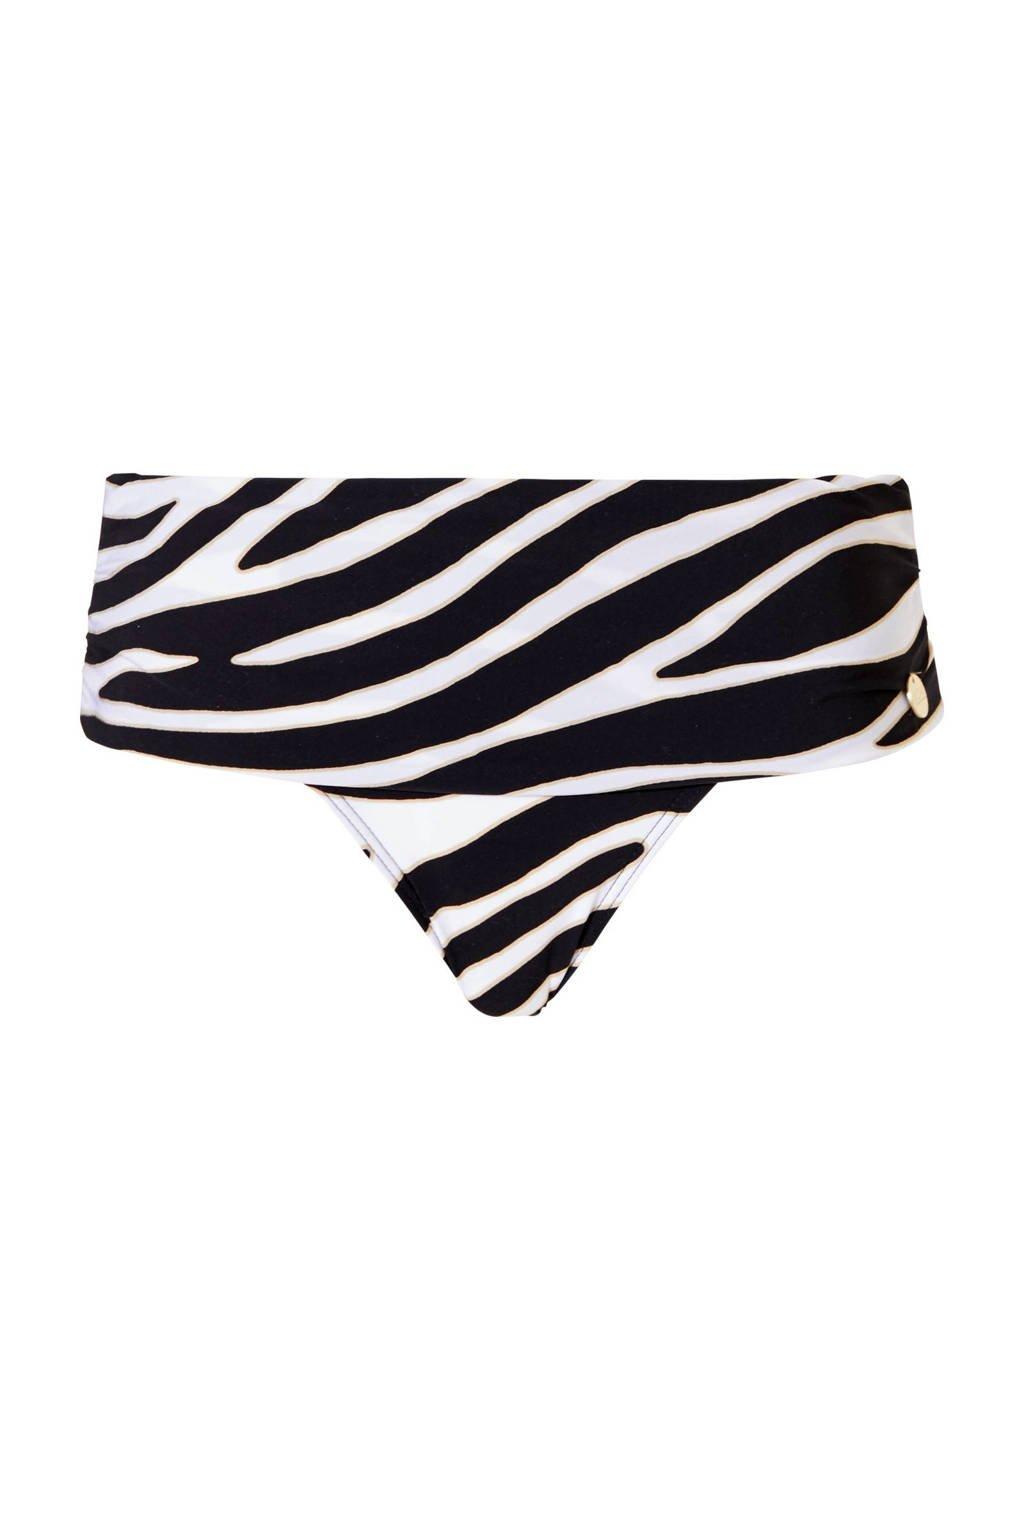 TC WOW omslag bikinibroekje met zebraprint zwart/wit, Zwart/wit